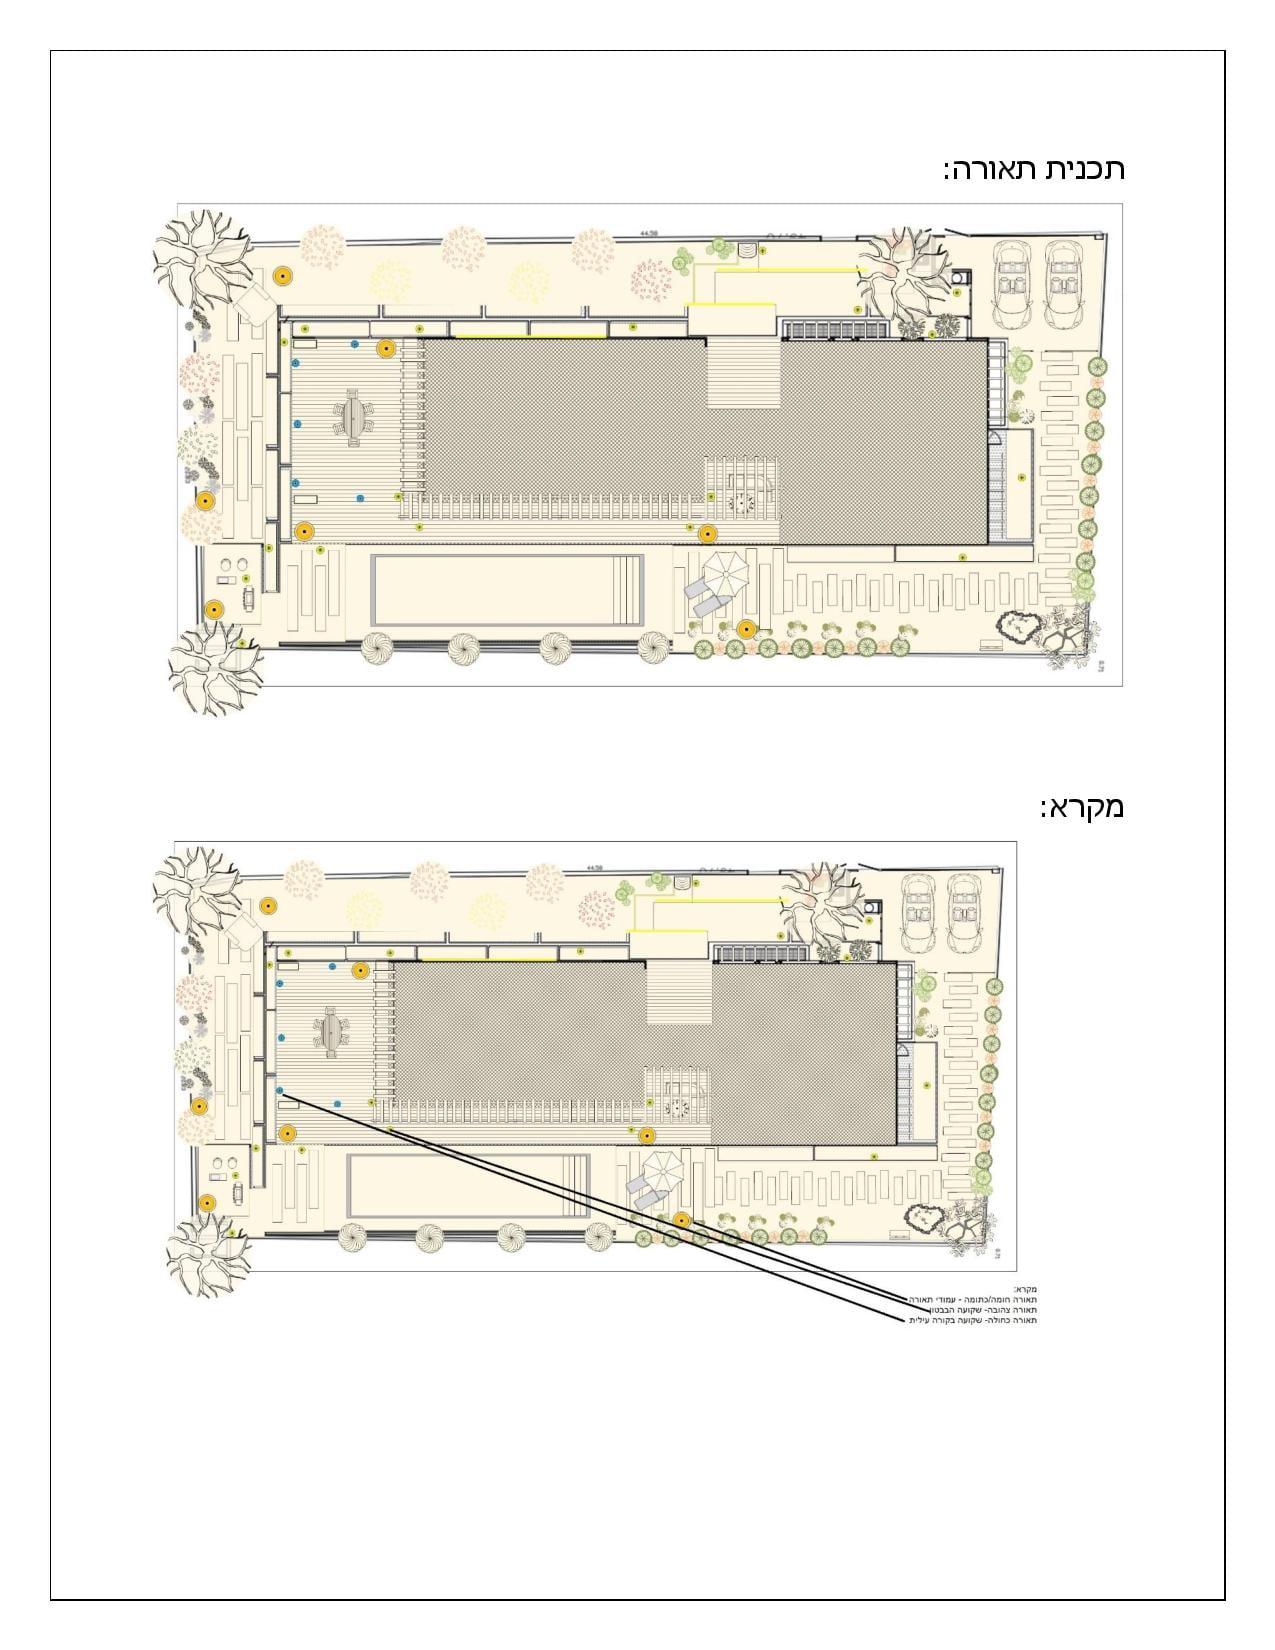 Document page 006 - דוגמא להצעת מחיר עבור עיצוב גינה